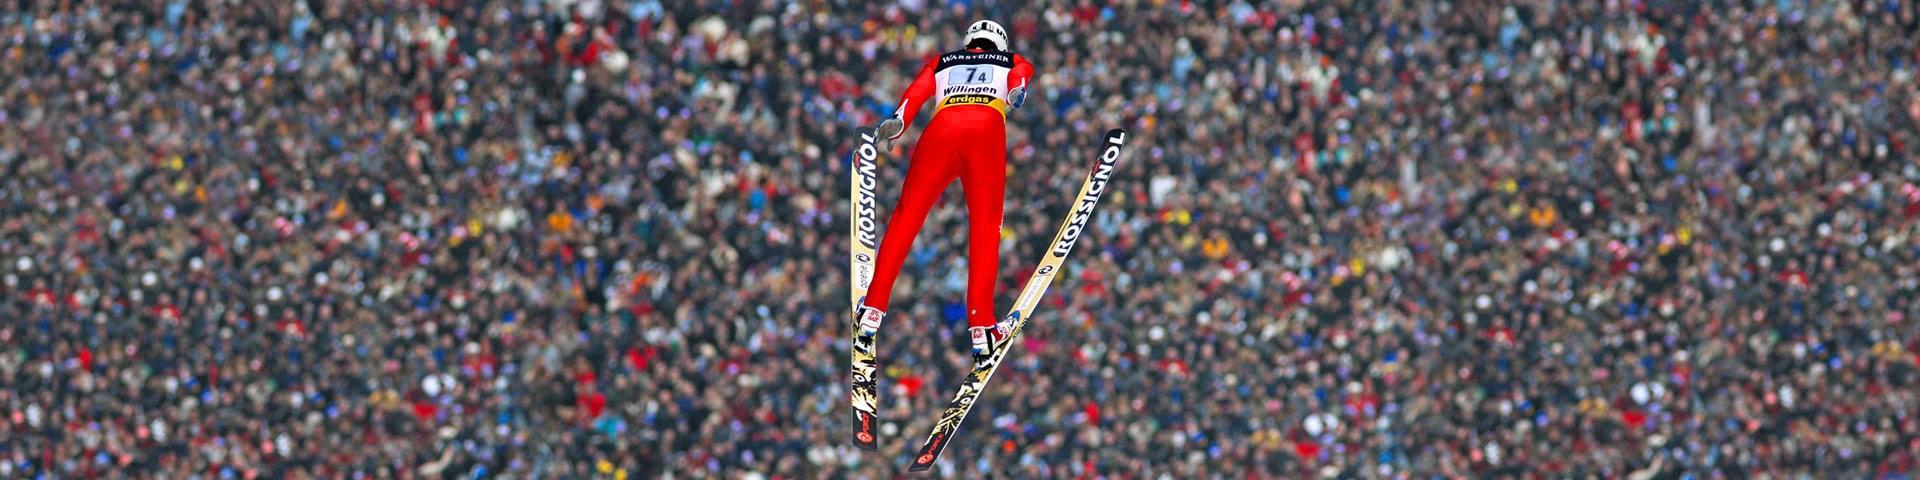 Skispringer beim Sprung in Willingen